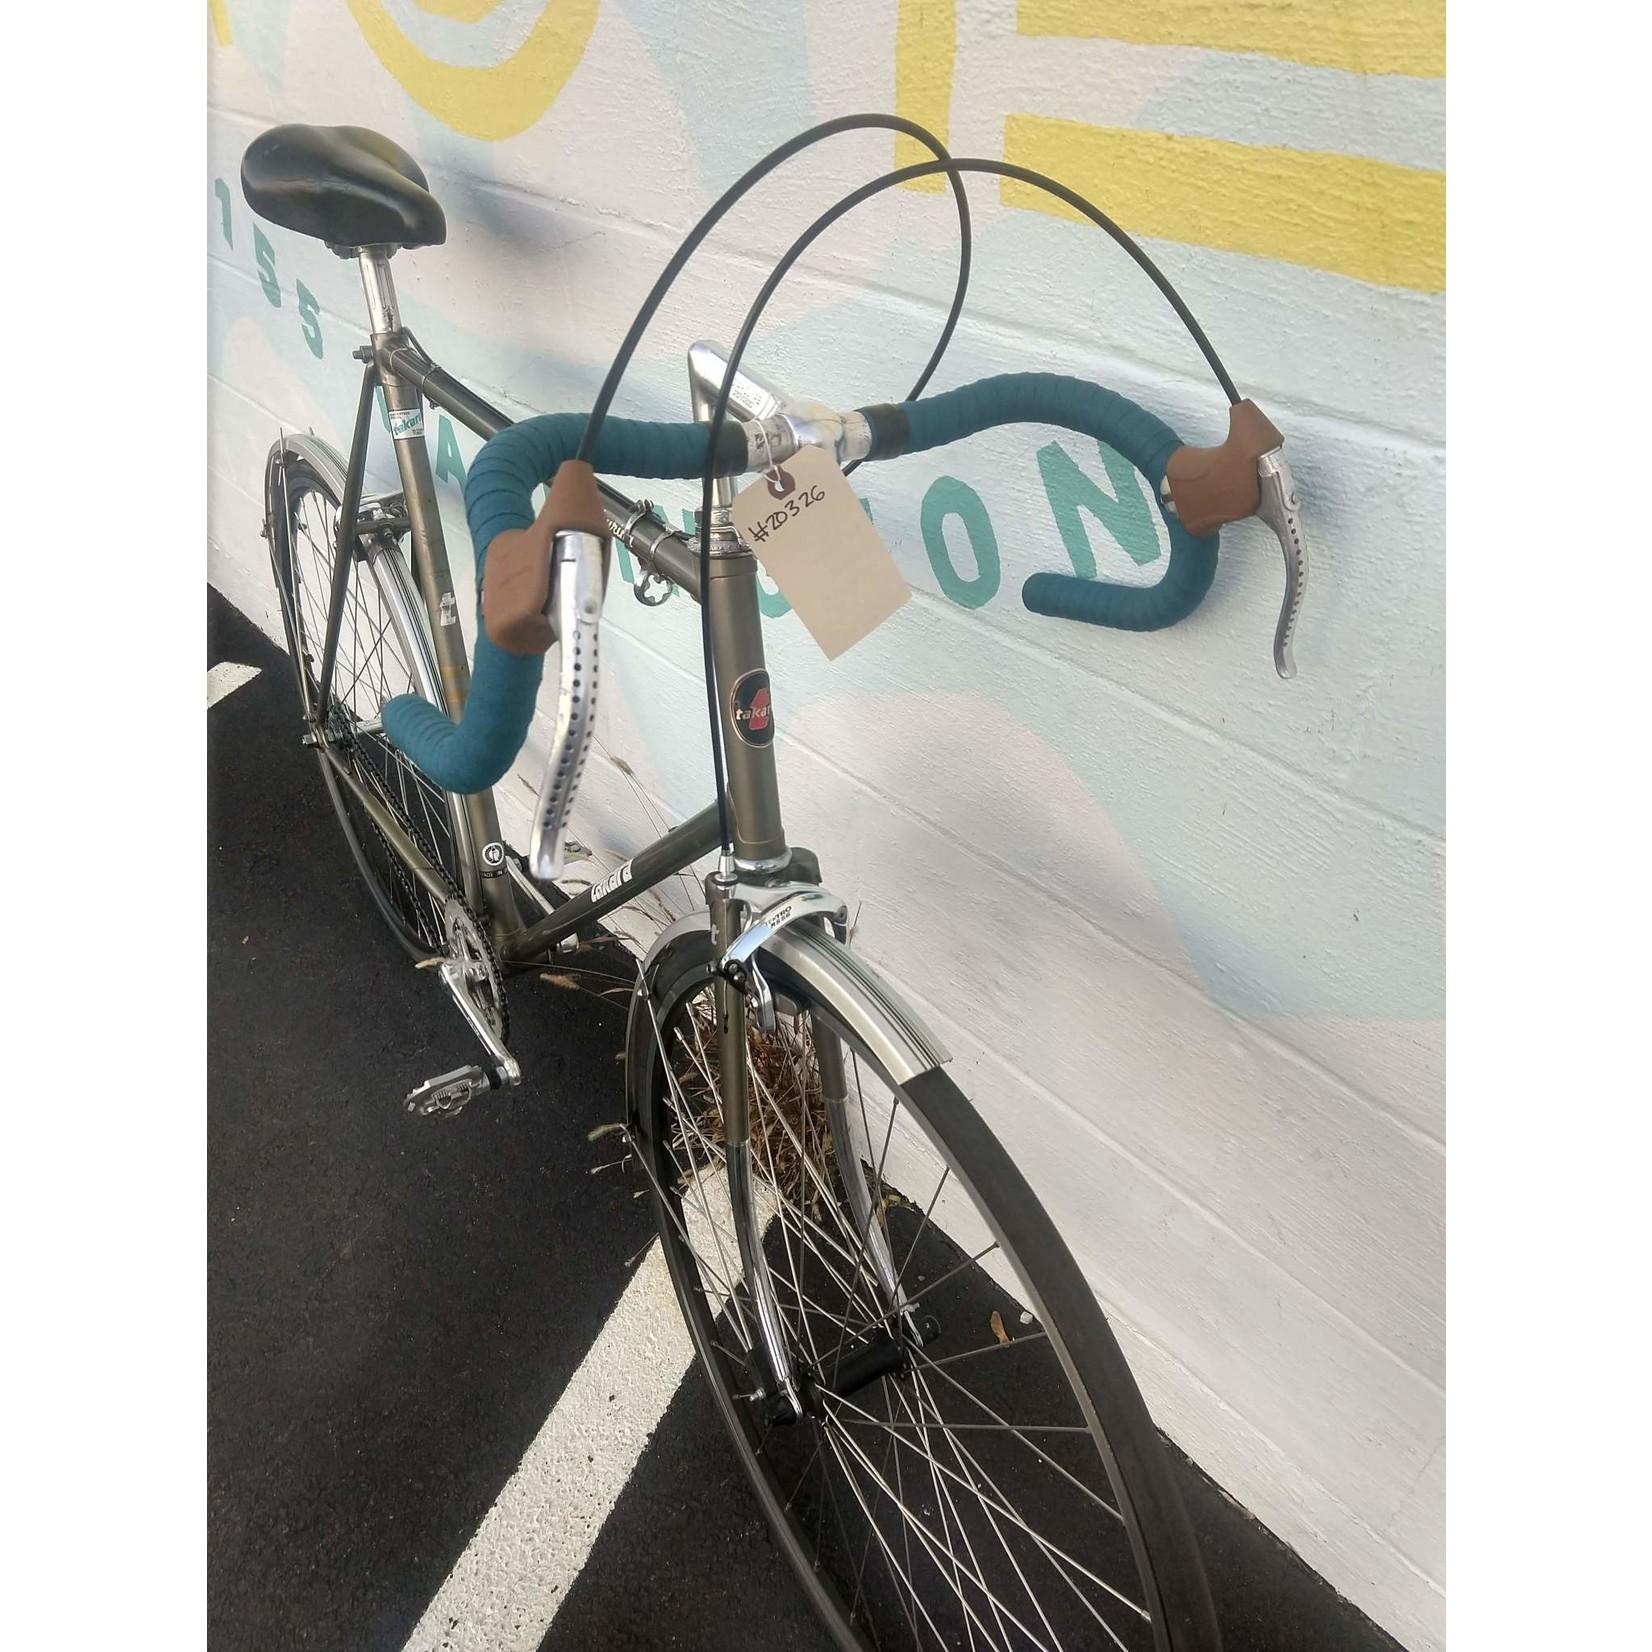 Portland Gear Hub Takara Grand Touring - 20326 - Grey - 62cm Frame - 700c Wheel